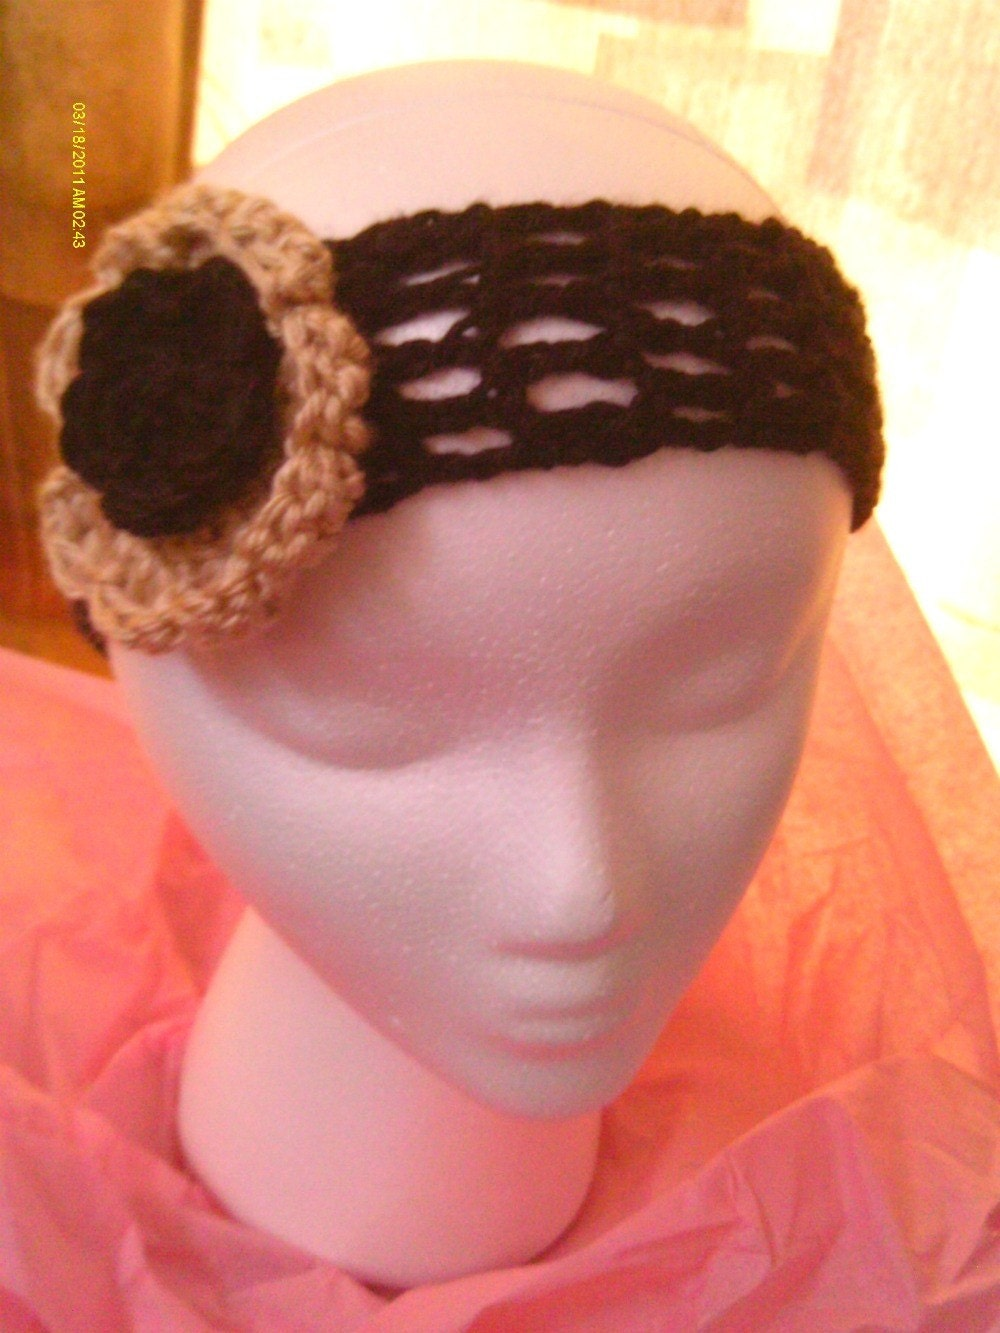 Buy ONE Get ONE Free SALE - Wide Hand Crochet Dreadband / Headband - Black & Tan